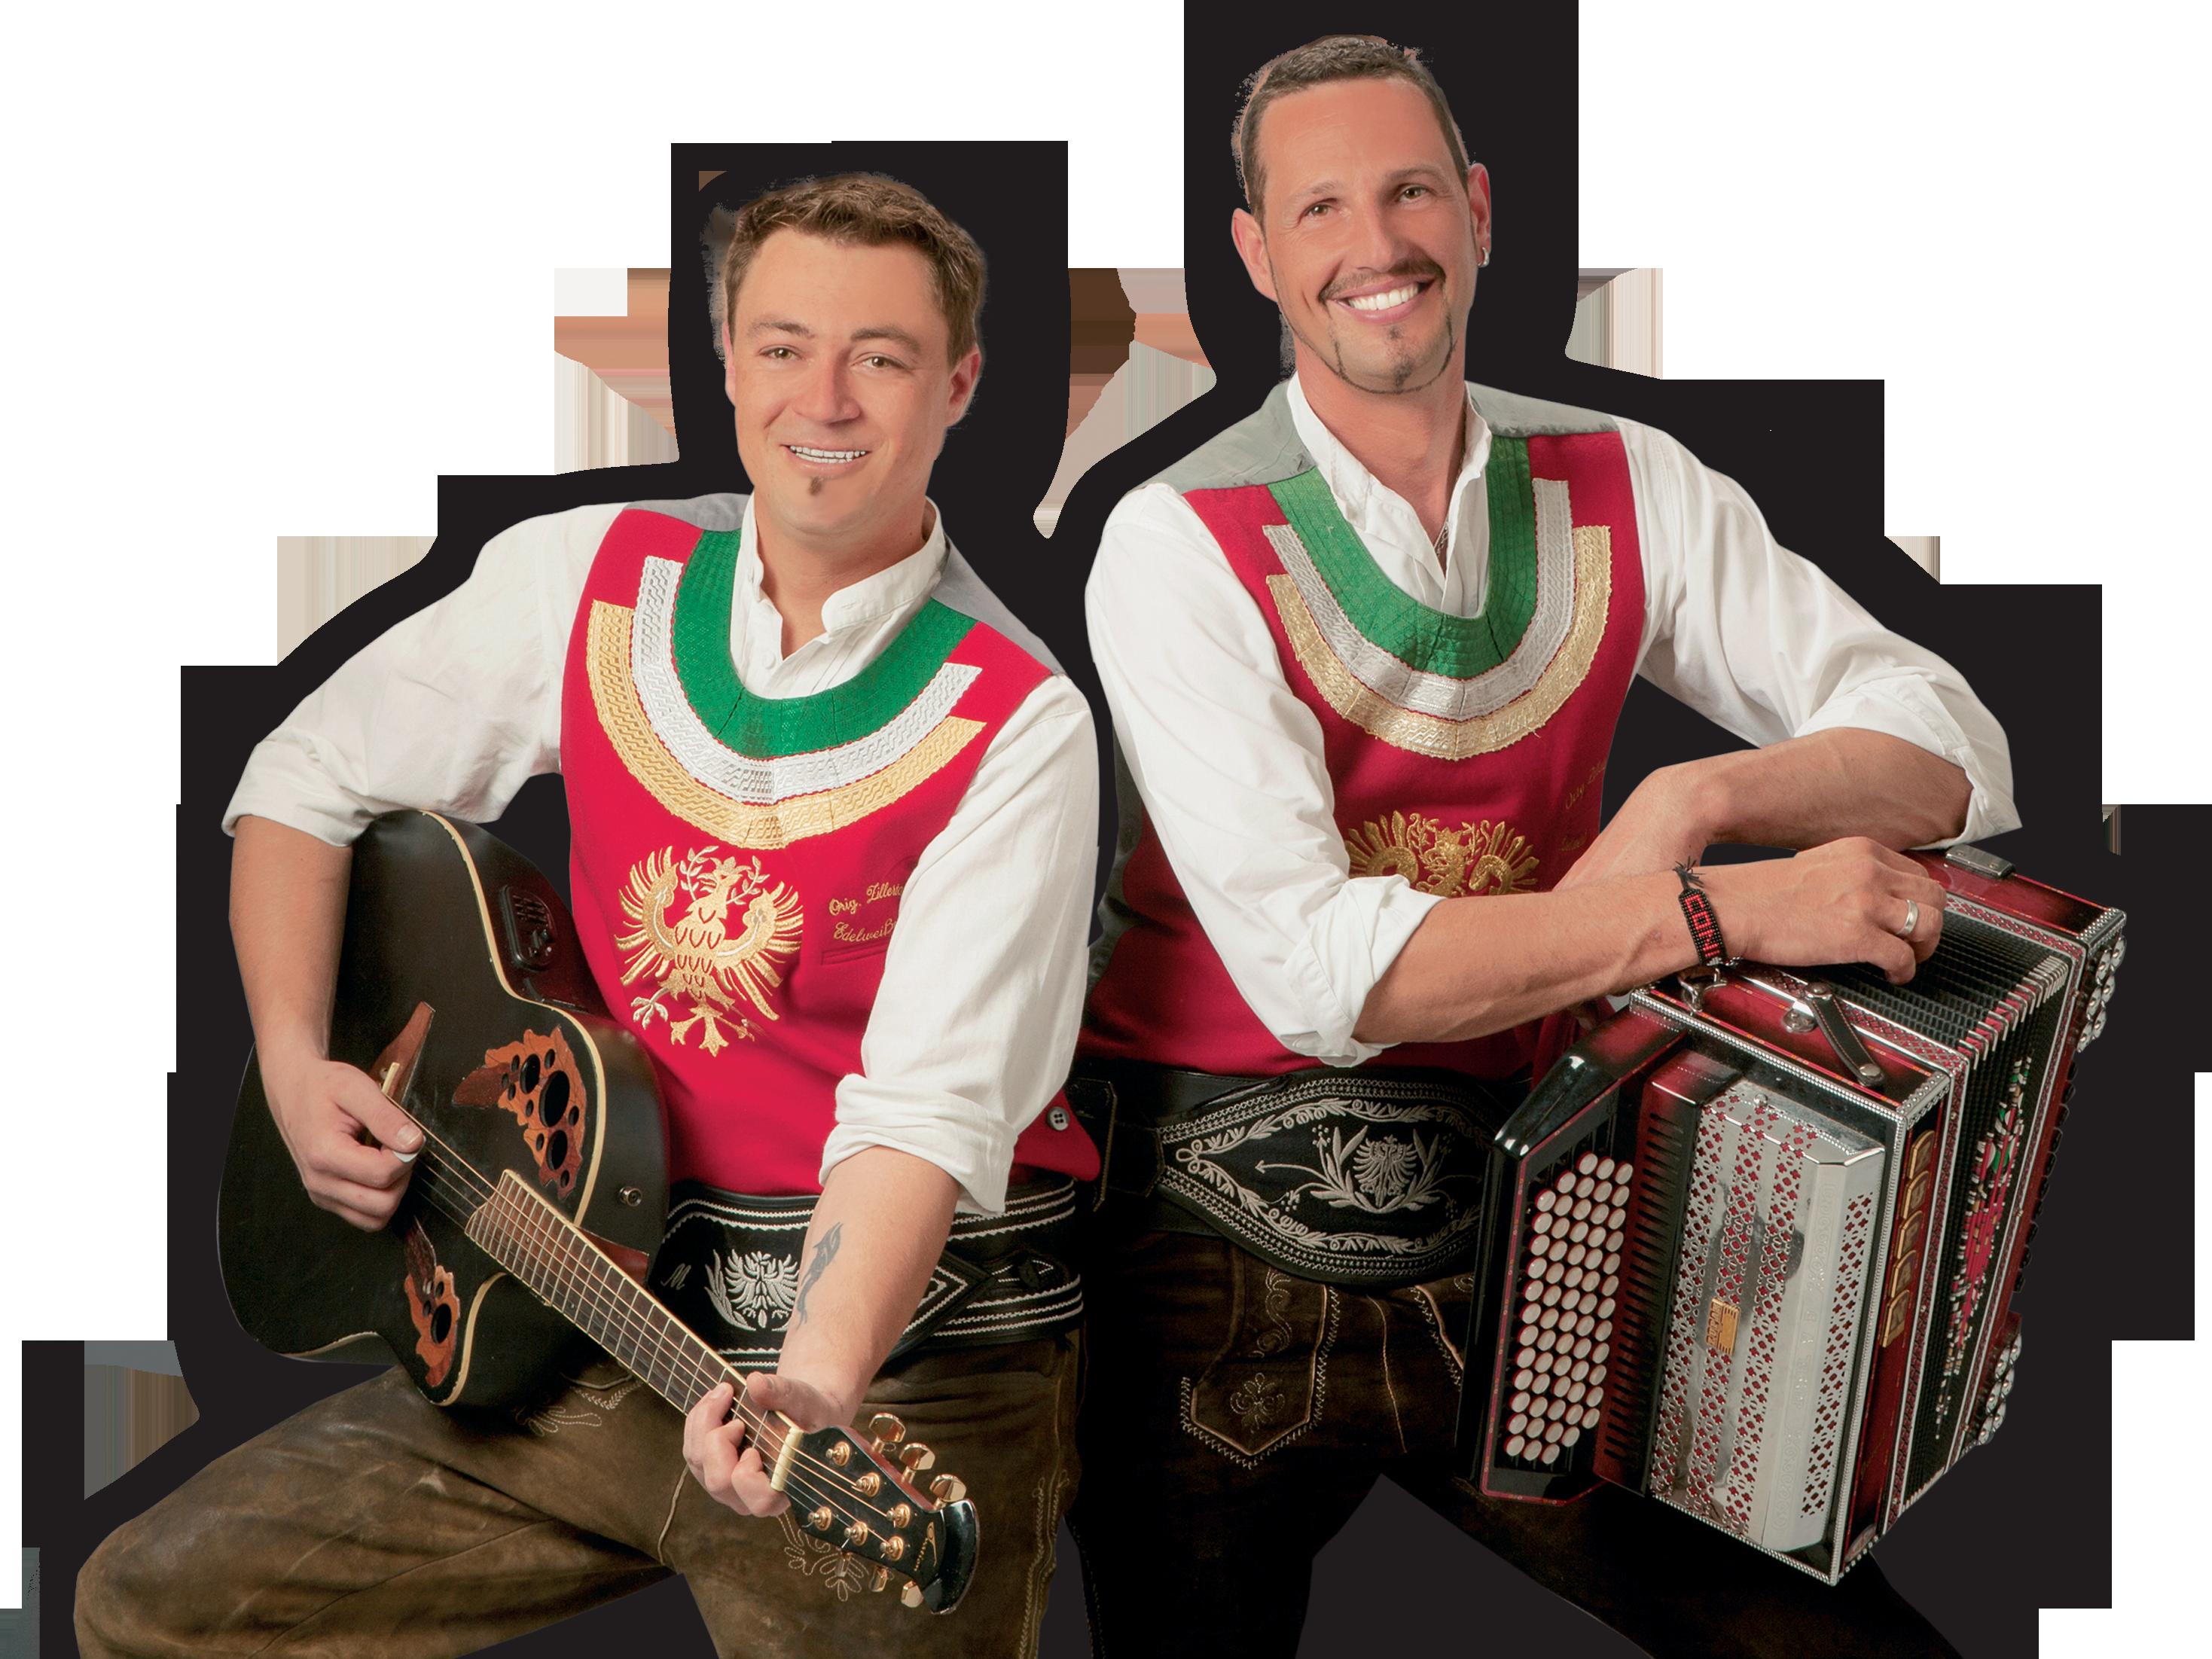 Zillertaler Edelweiss Duo